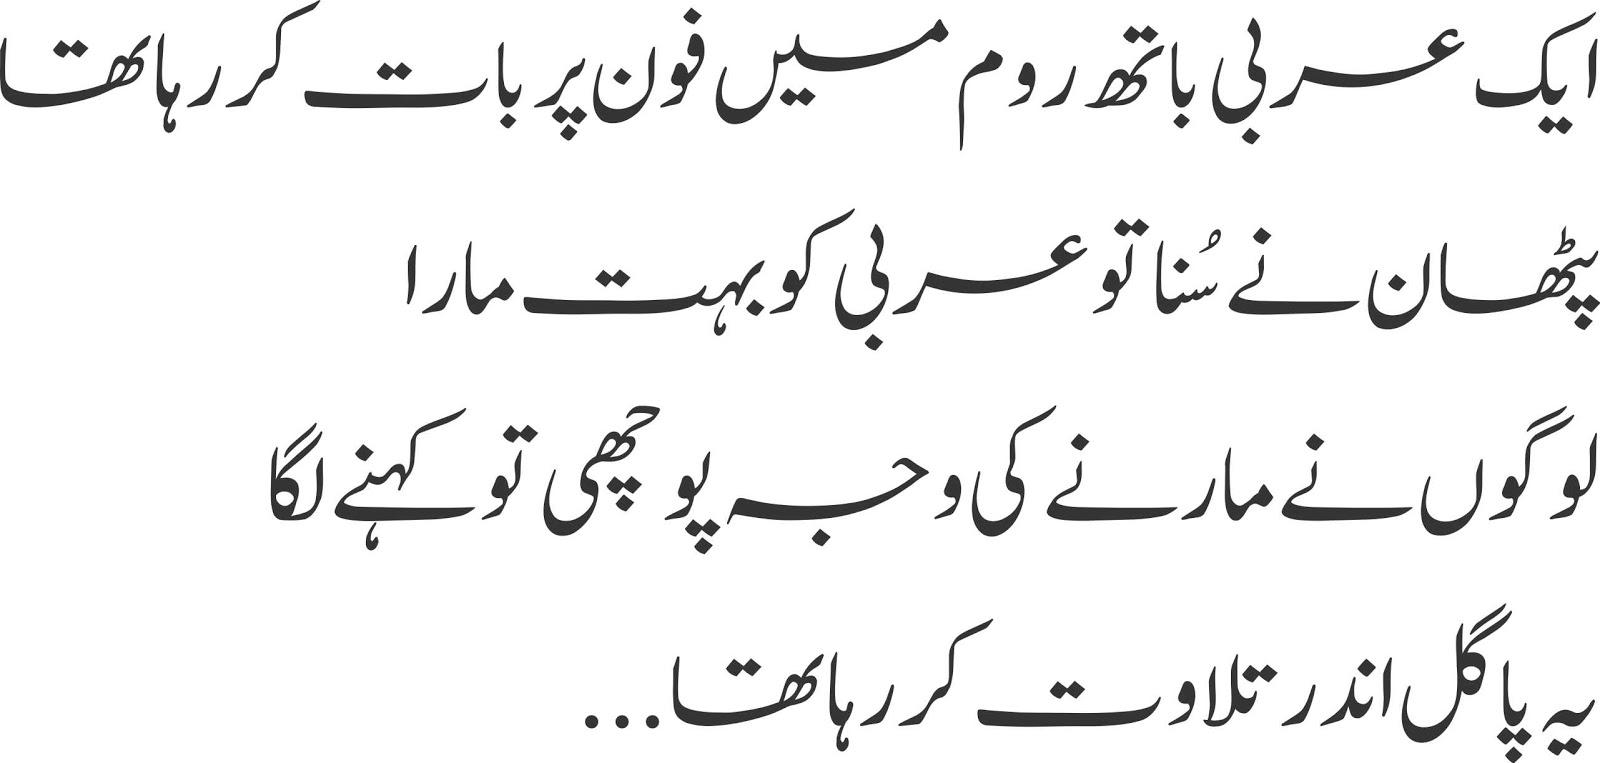 Muhammad Bin Qasim History In Urdu Book